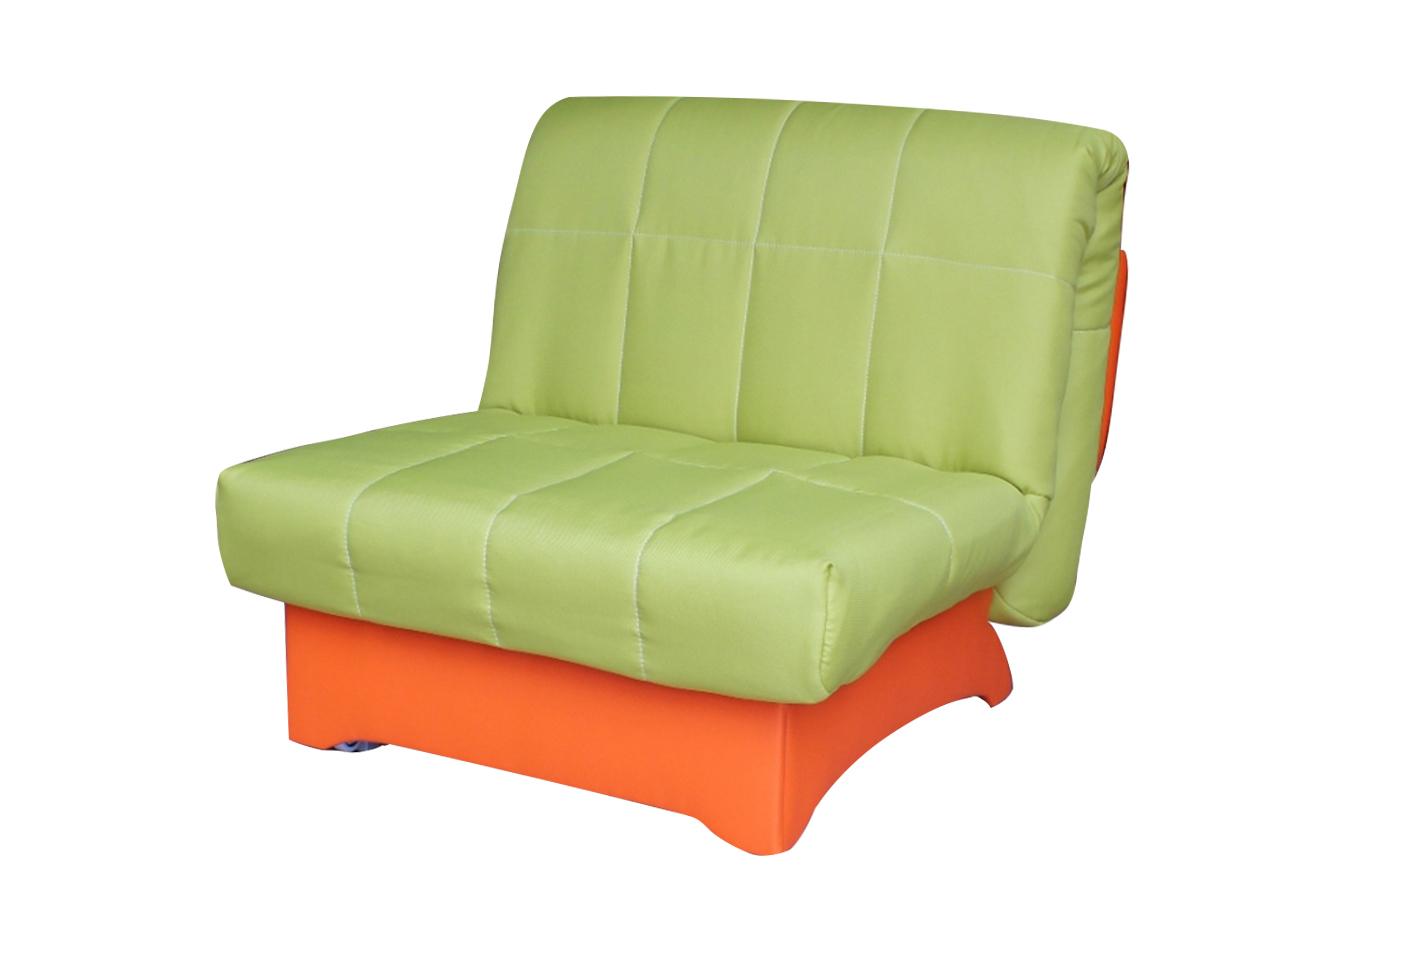 Кресло-кровать Аккорд-2 Neo apple